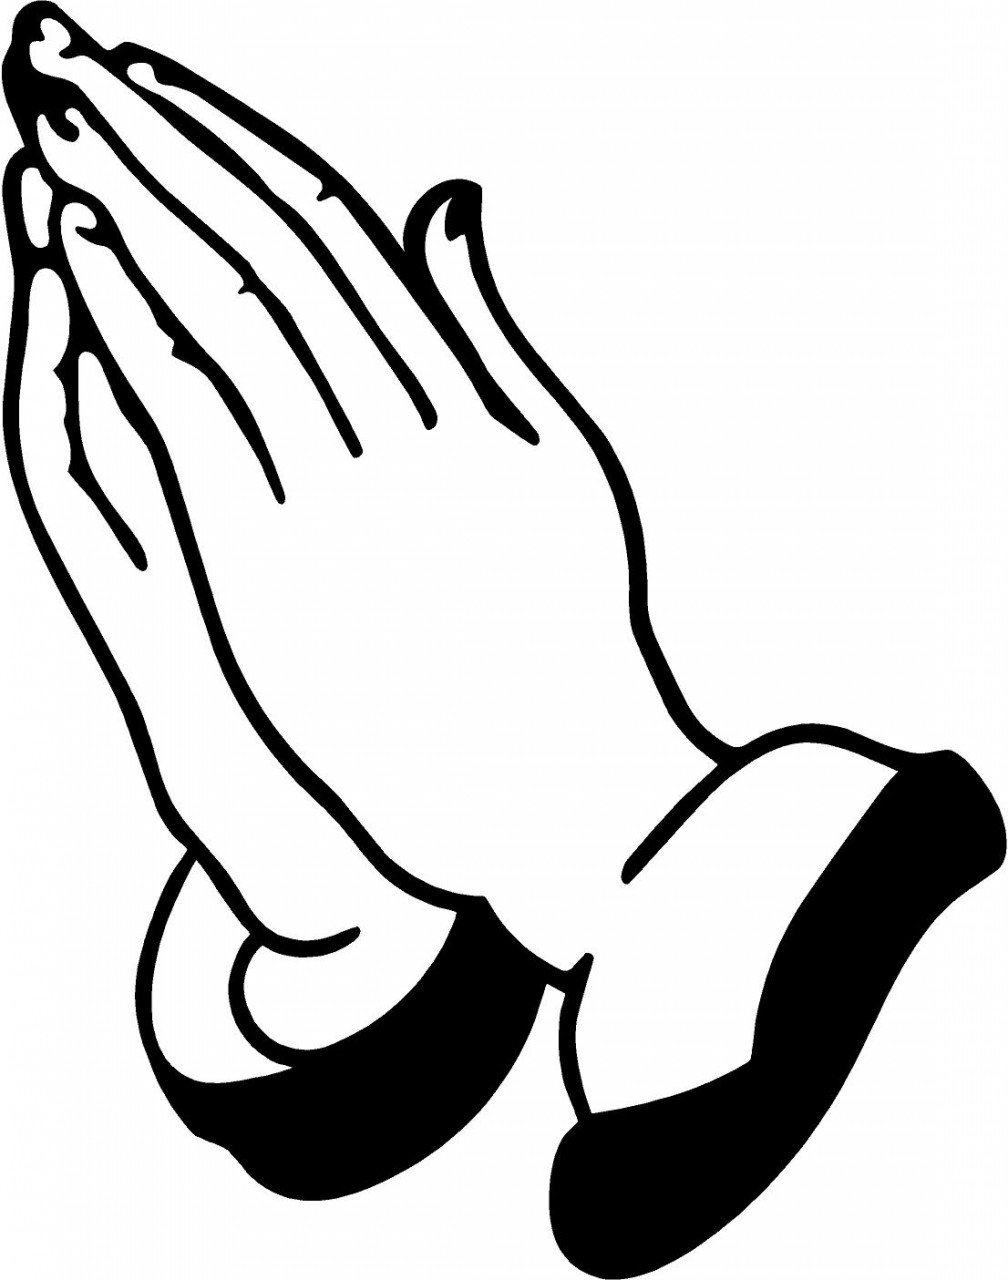 Prayer Hands Clipart Clipart .-Prayer Hands Clipart Clipart .-8